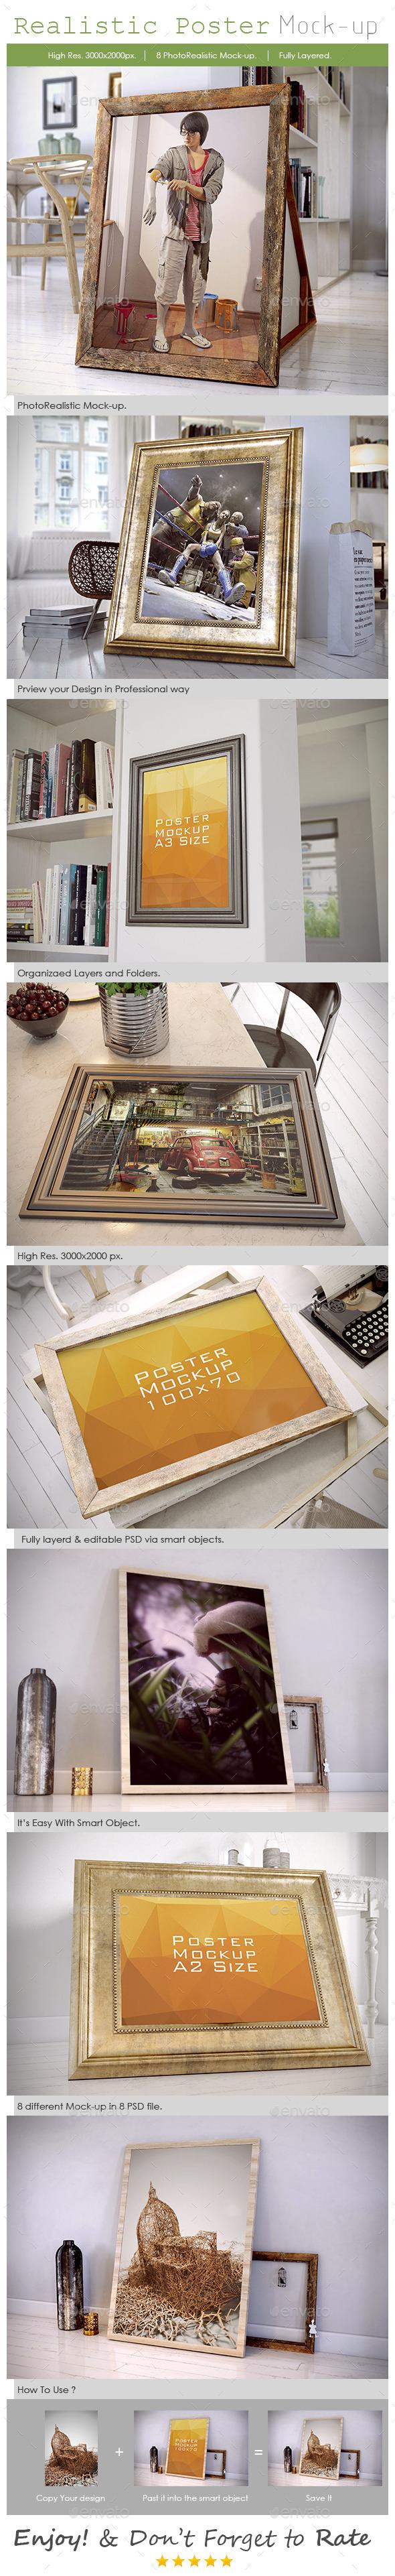 GraphicRiver Realistic Poster Mockup 9085907